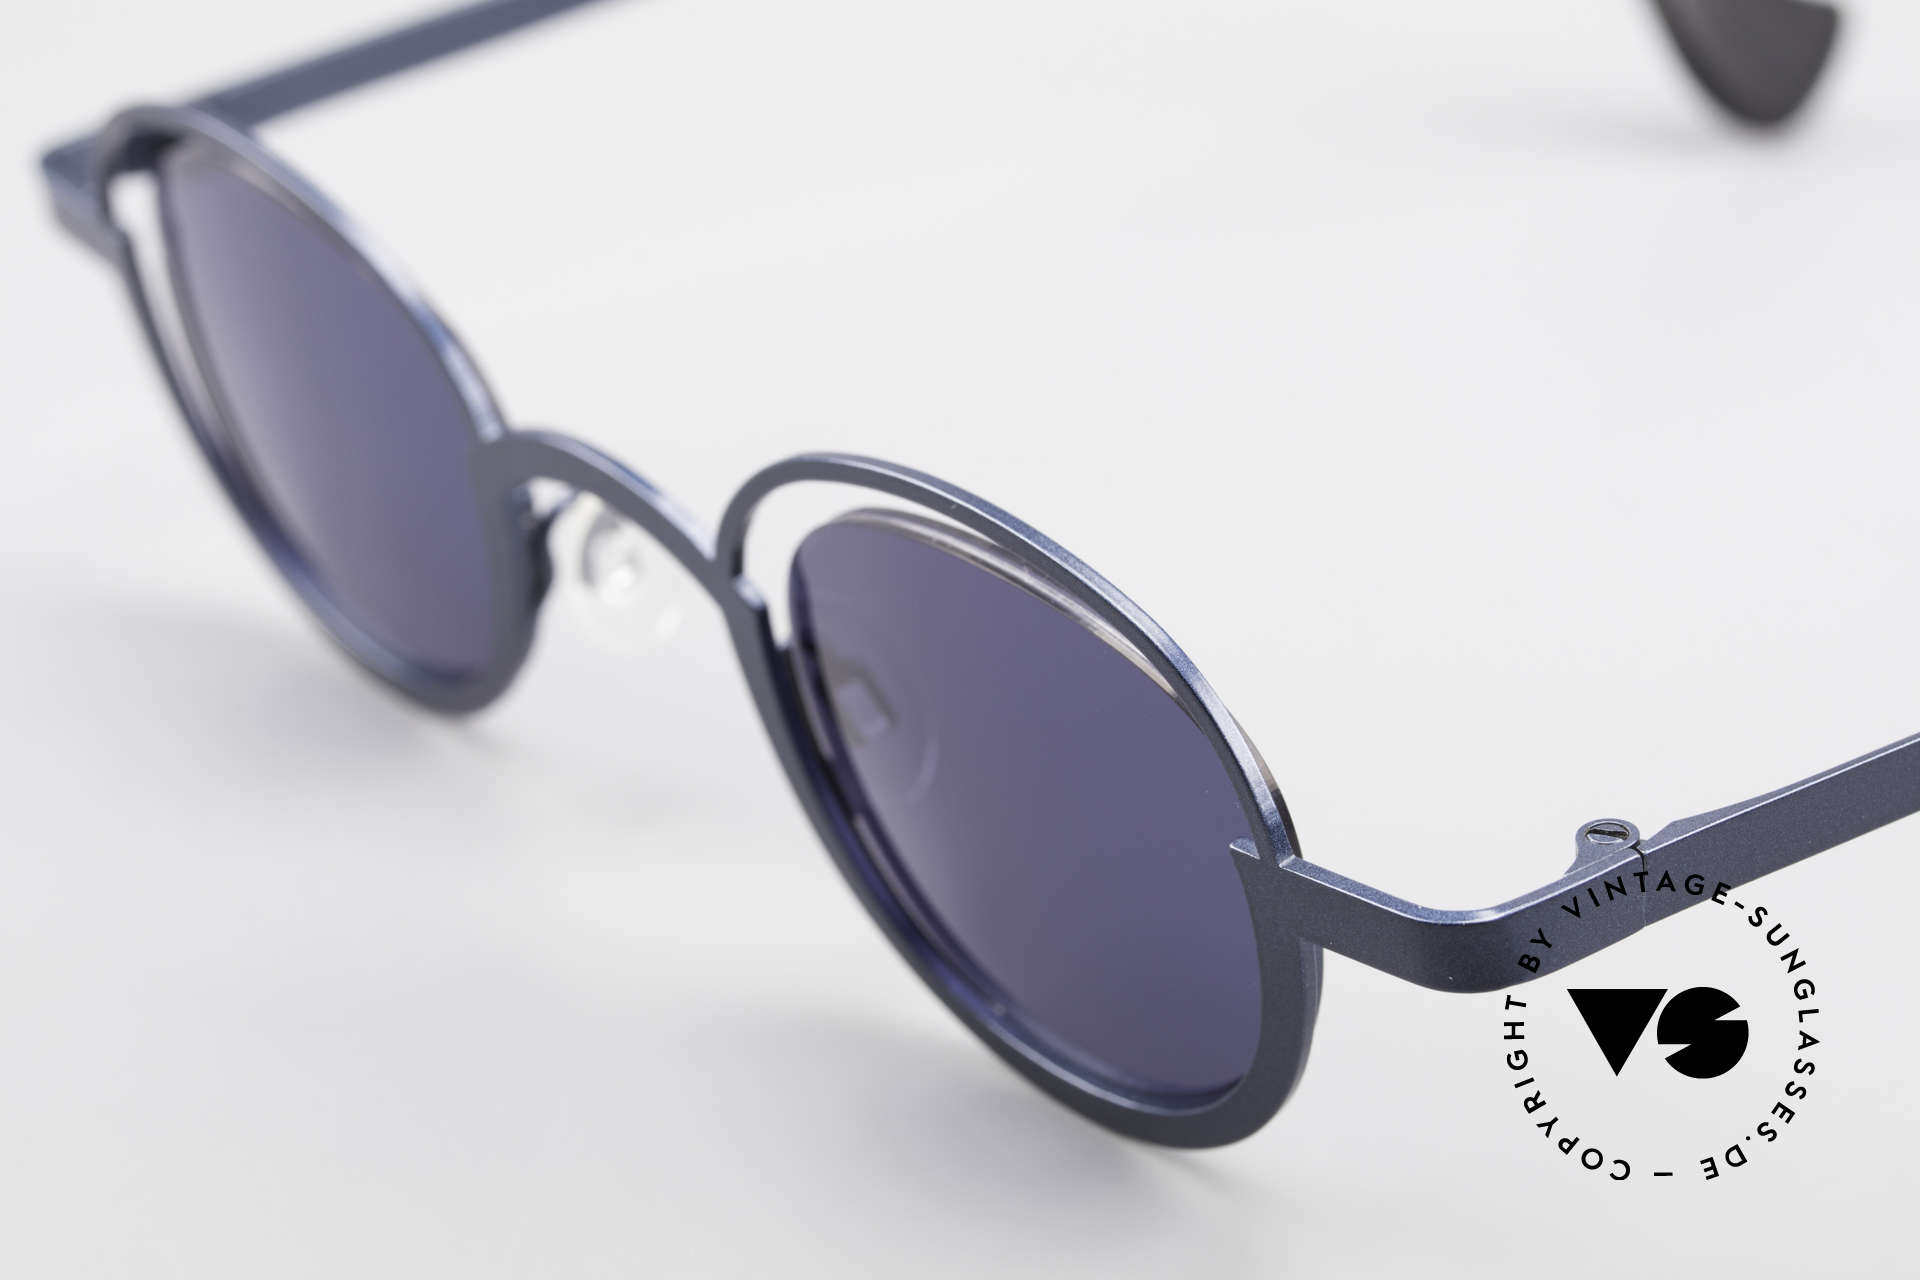 Theo Belgium Dozy Slim Crazy 90's Unisex Sunglasses, an extraordinary designer piece by THEO BELGIUM, Made for Men and Women